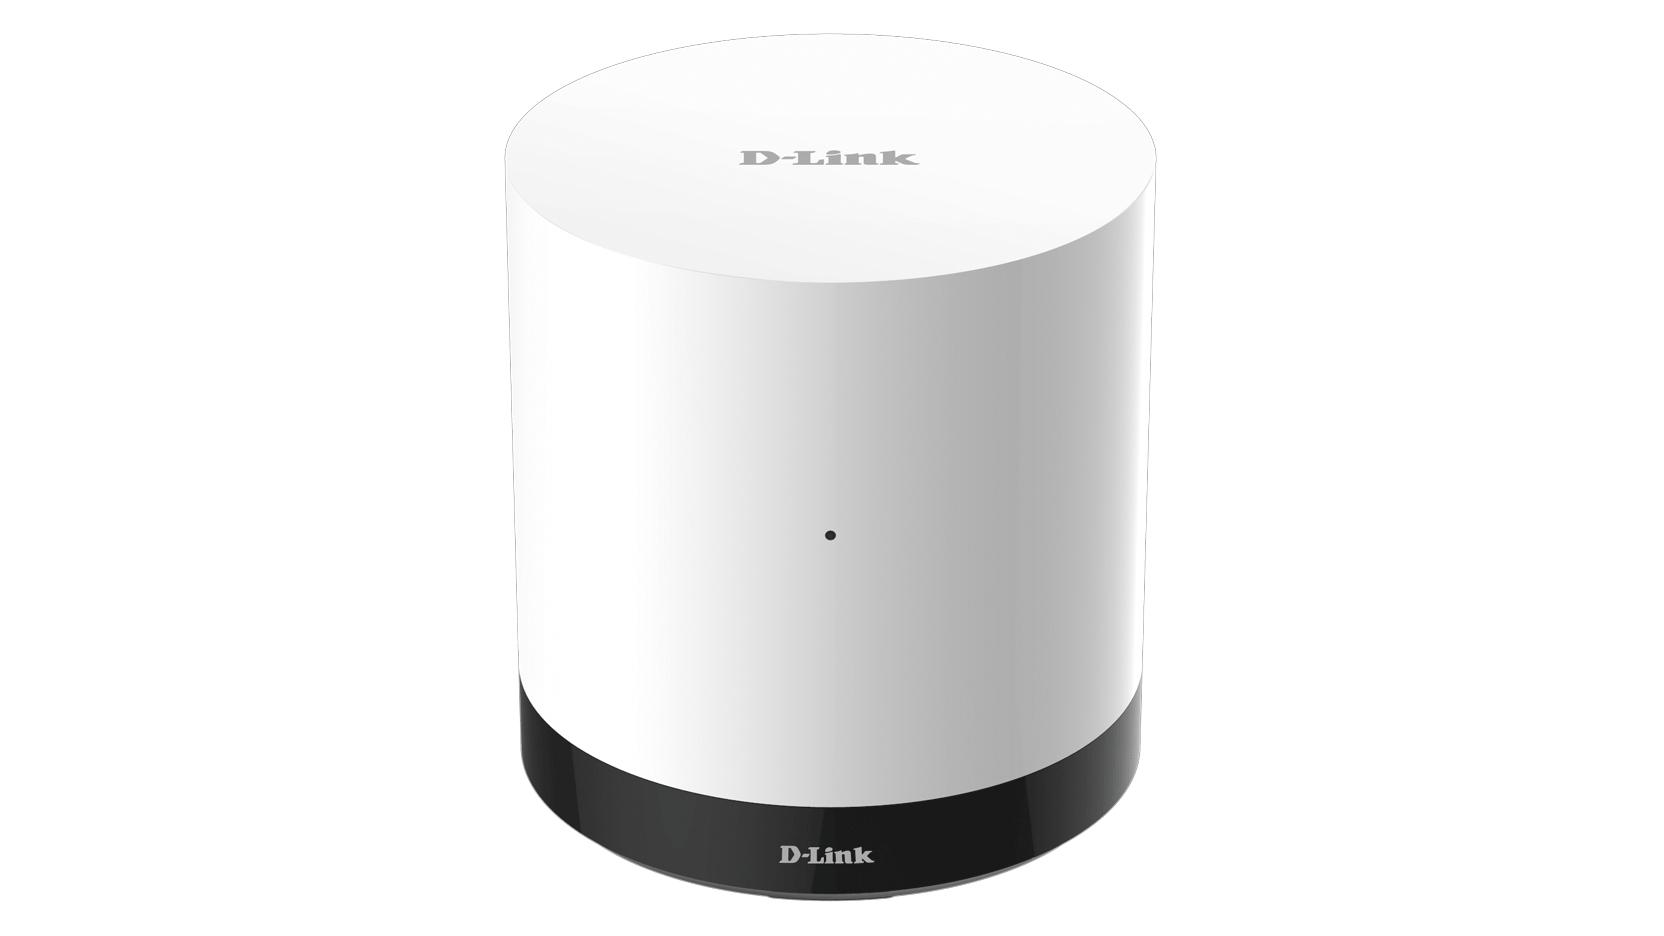 D-Link mydlink Connected Home Hub